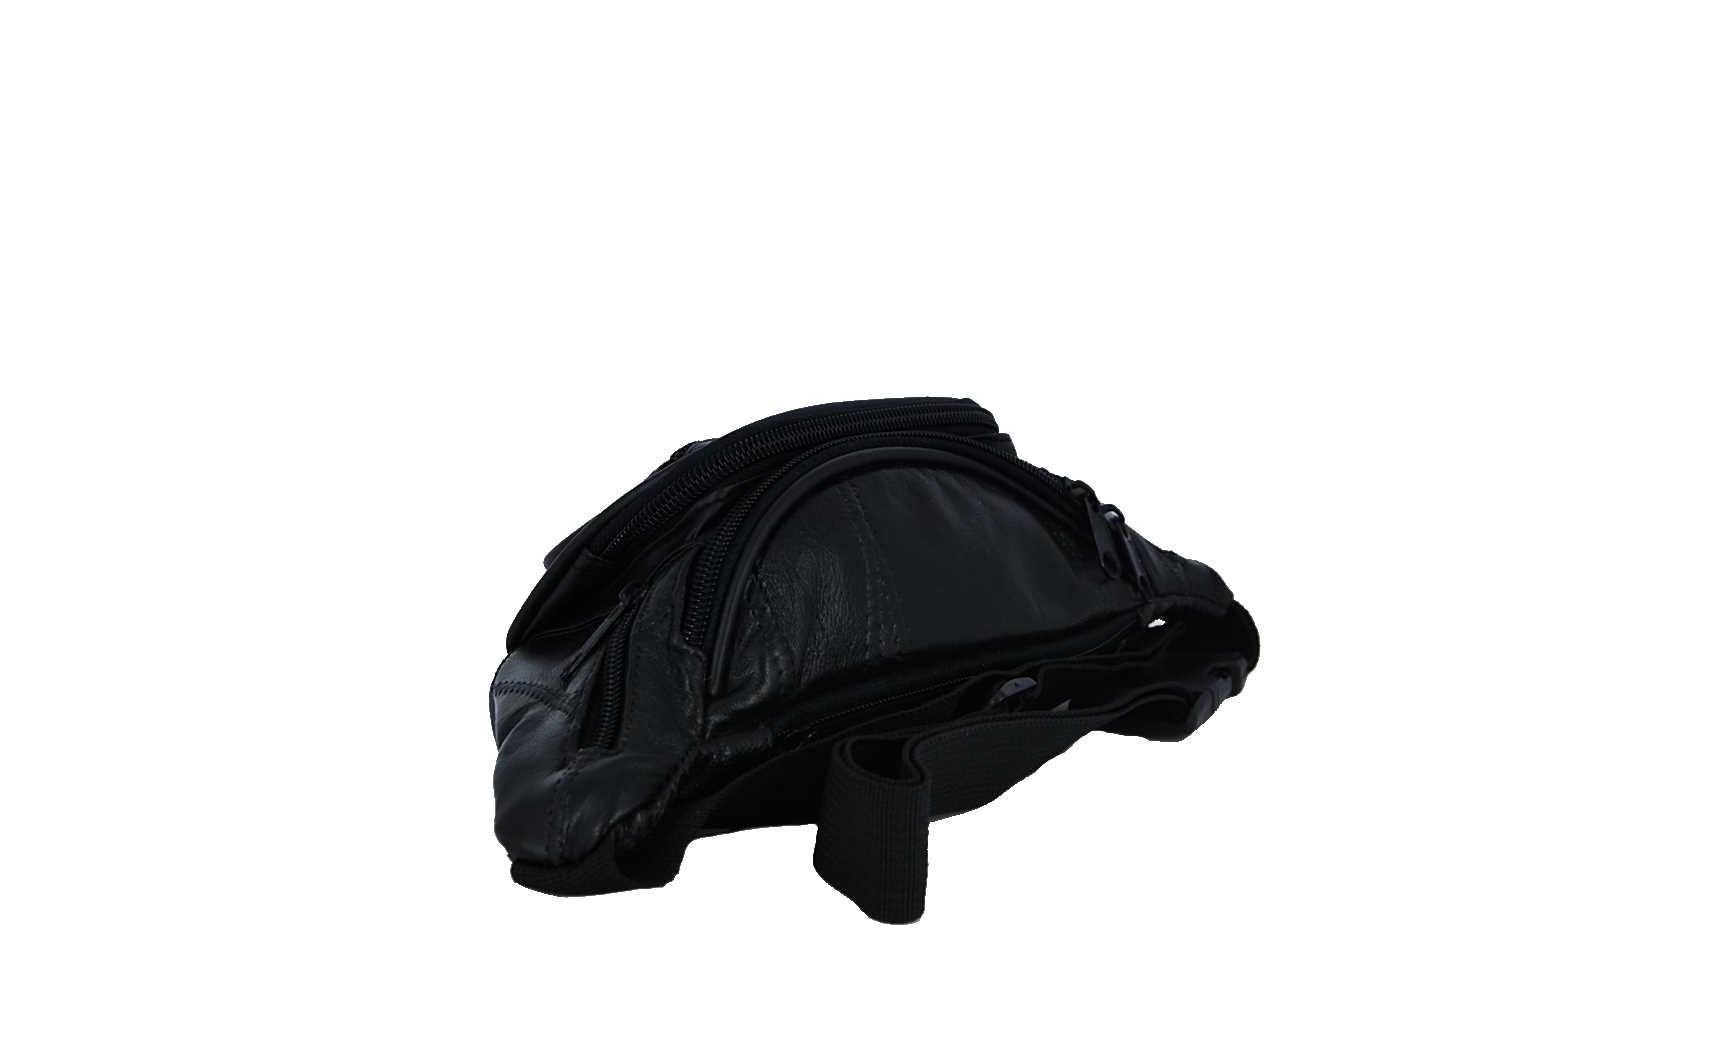 3a238e1d84 GS τσαντάκι μέσης ανδρικό μαύρο μικρό